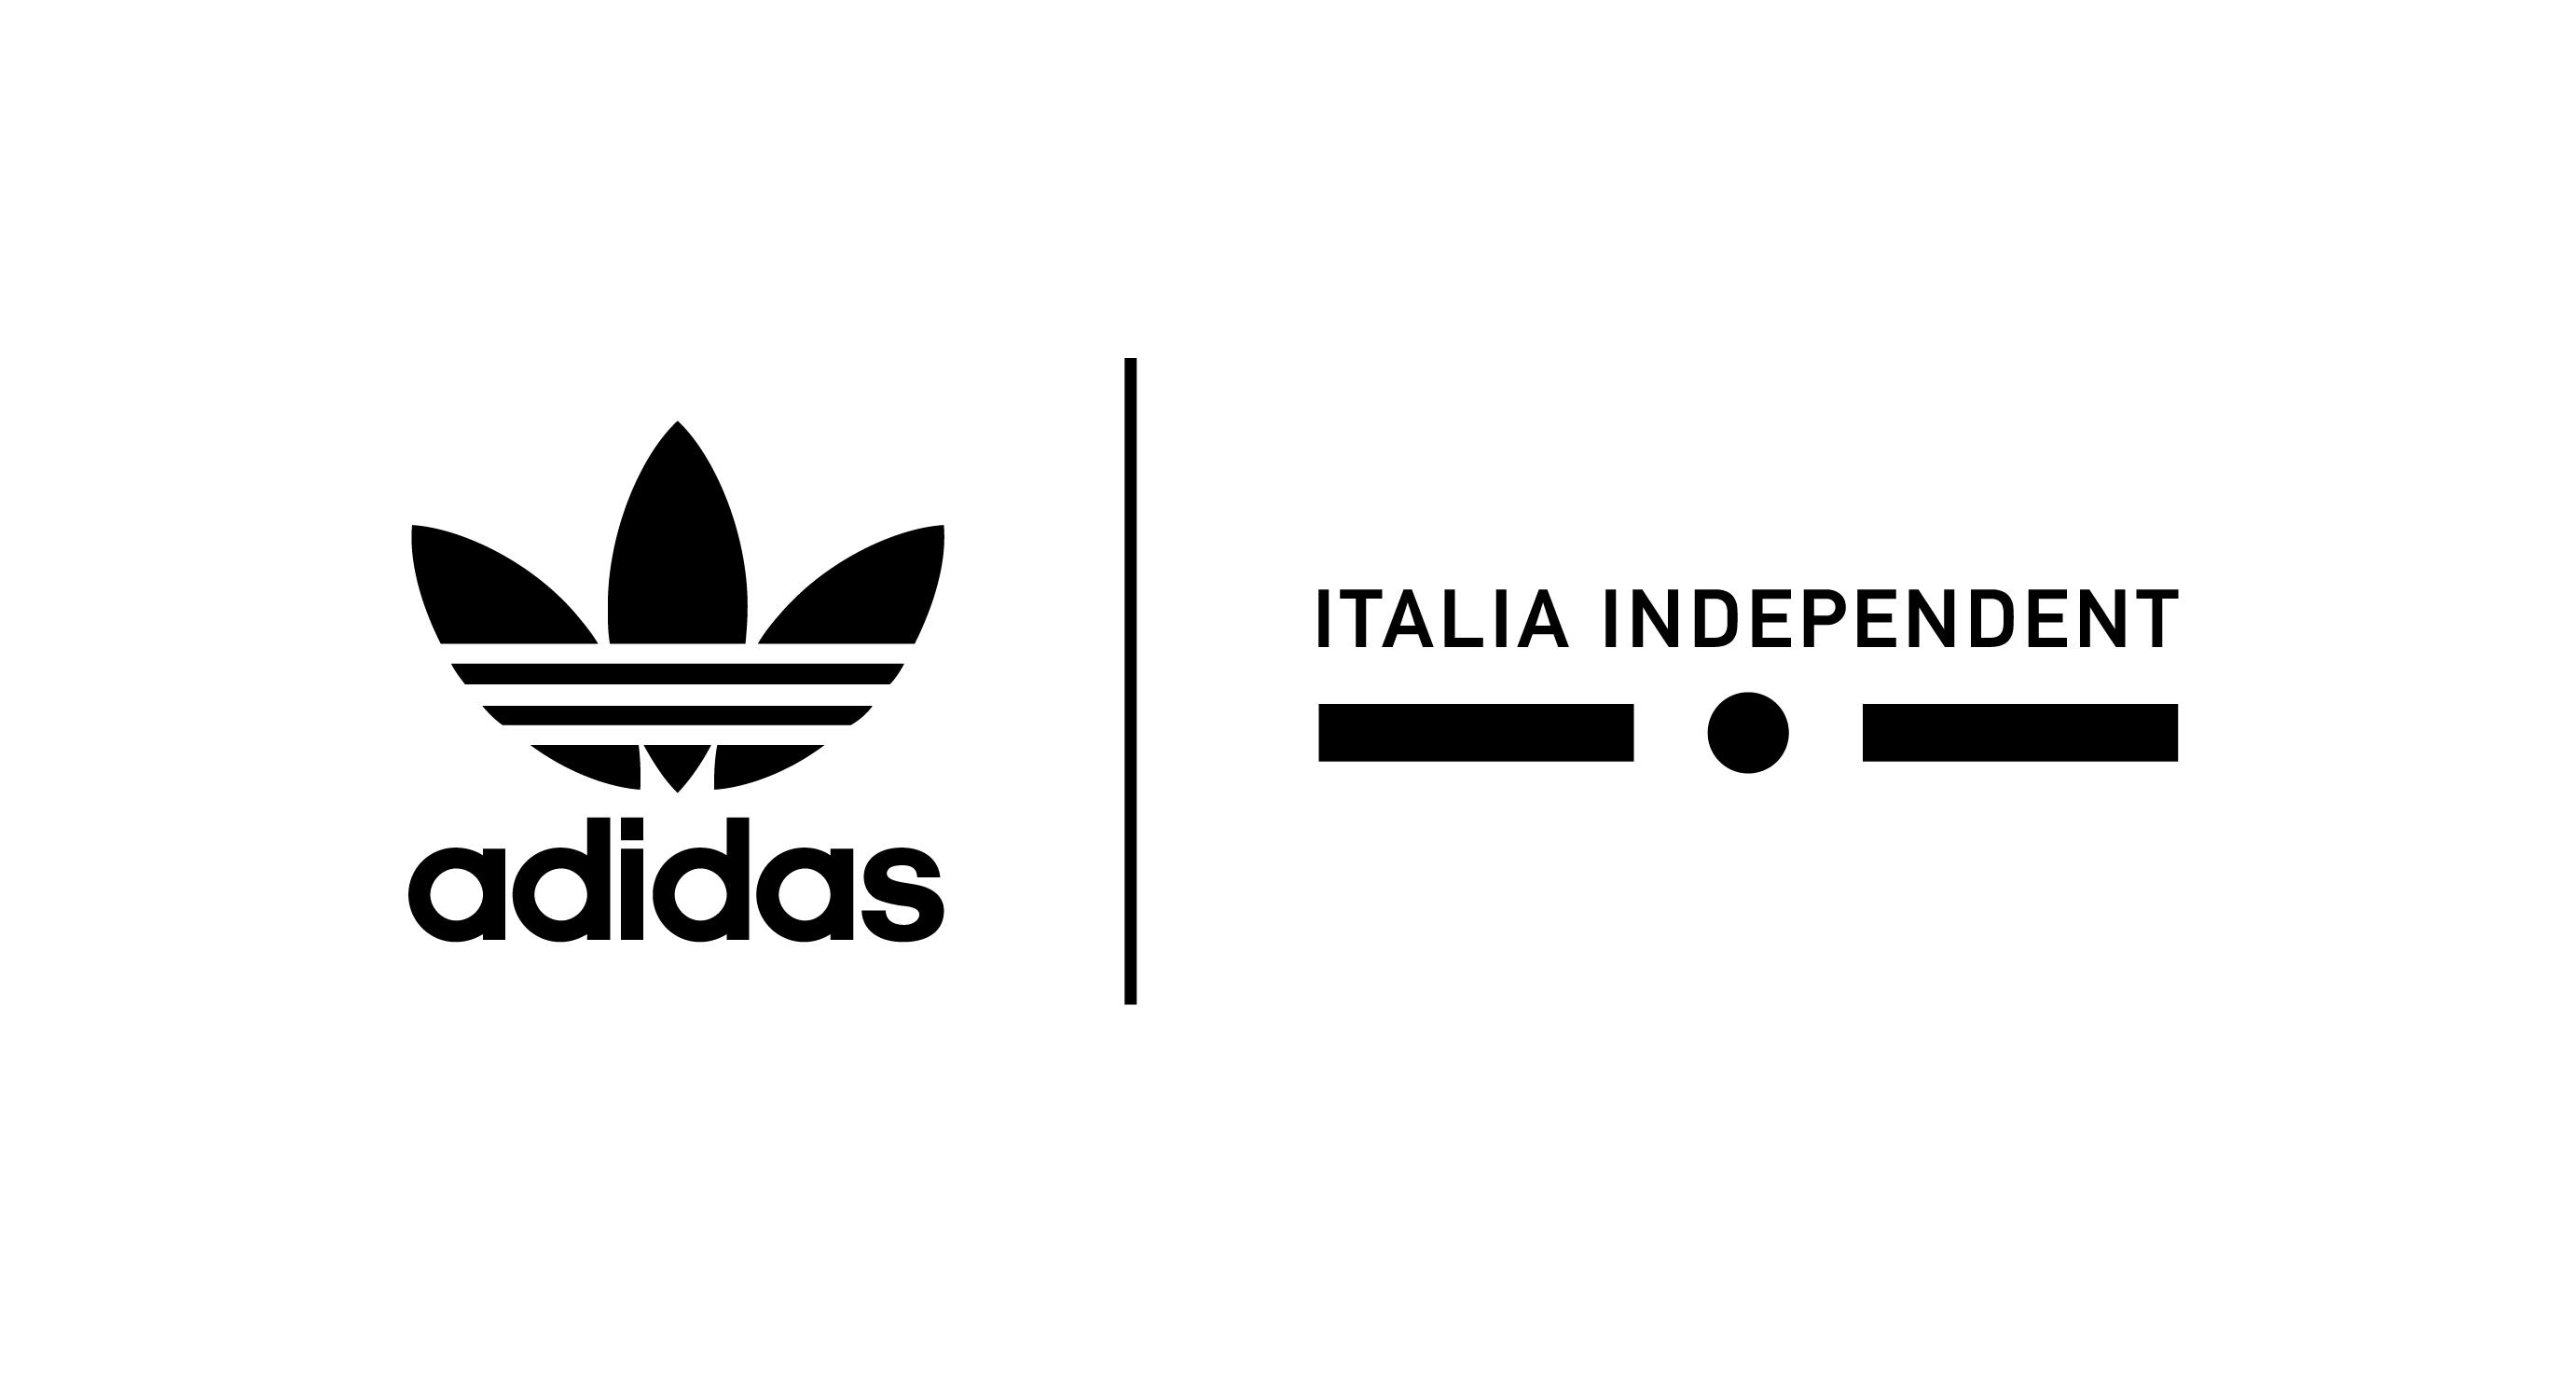 Italia Independent E Adidas Insieme Per Il Settore Eyewear